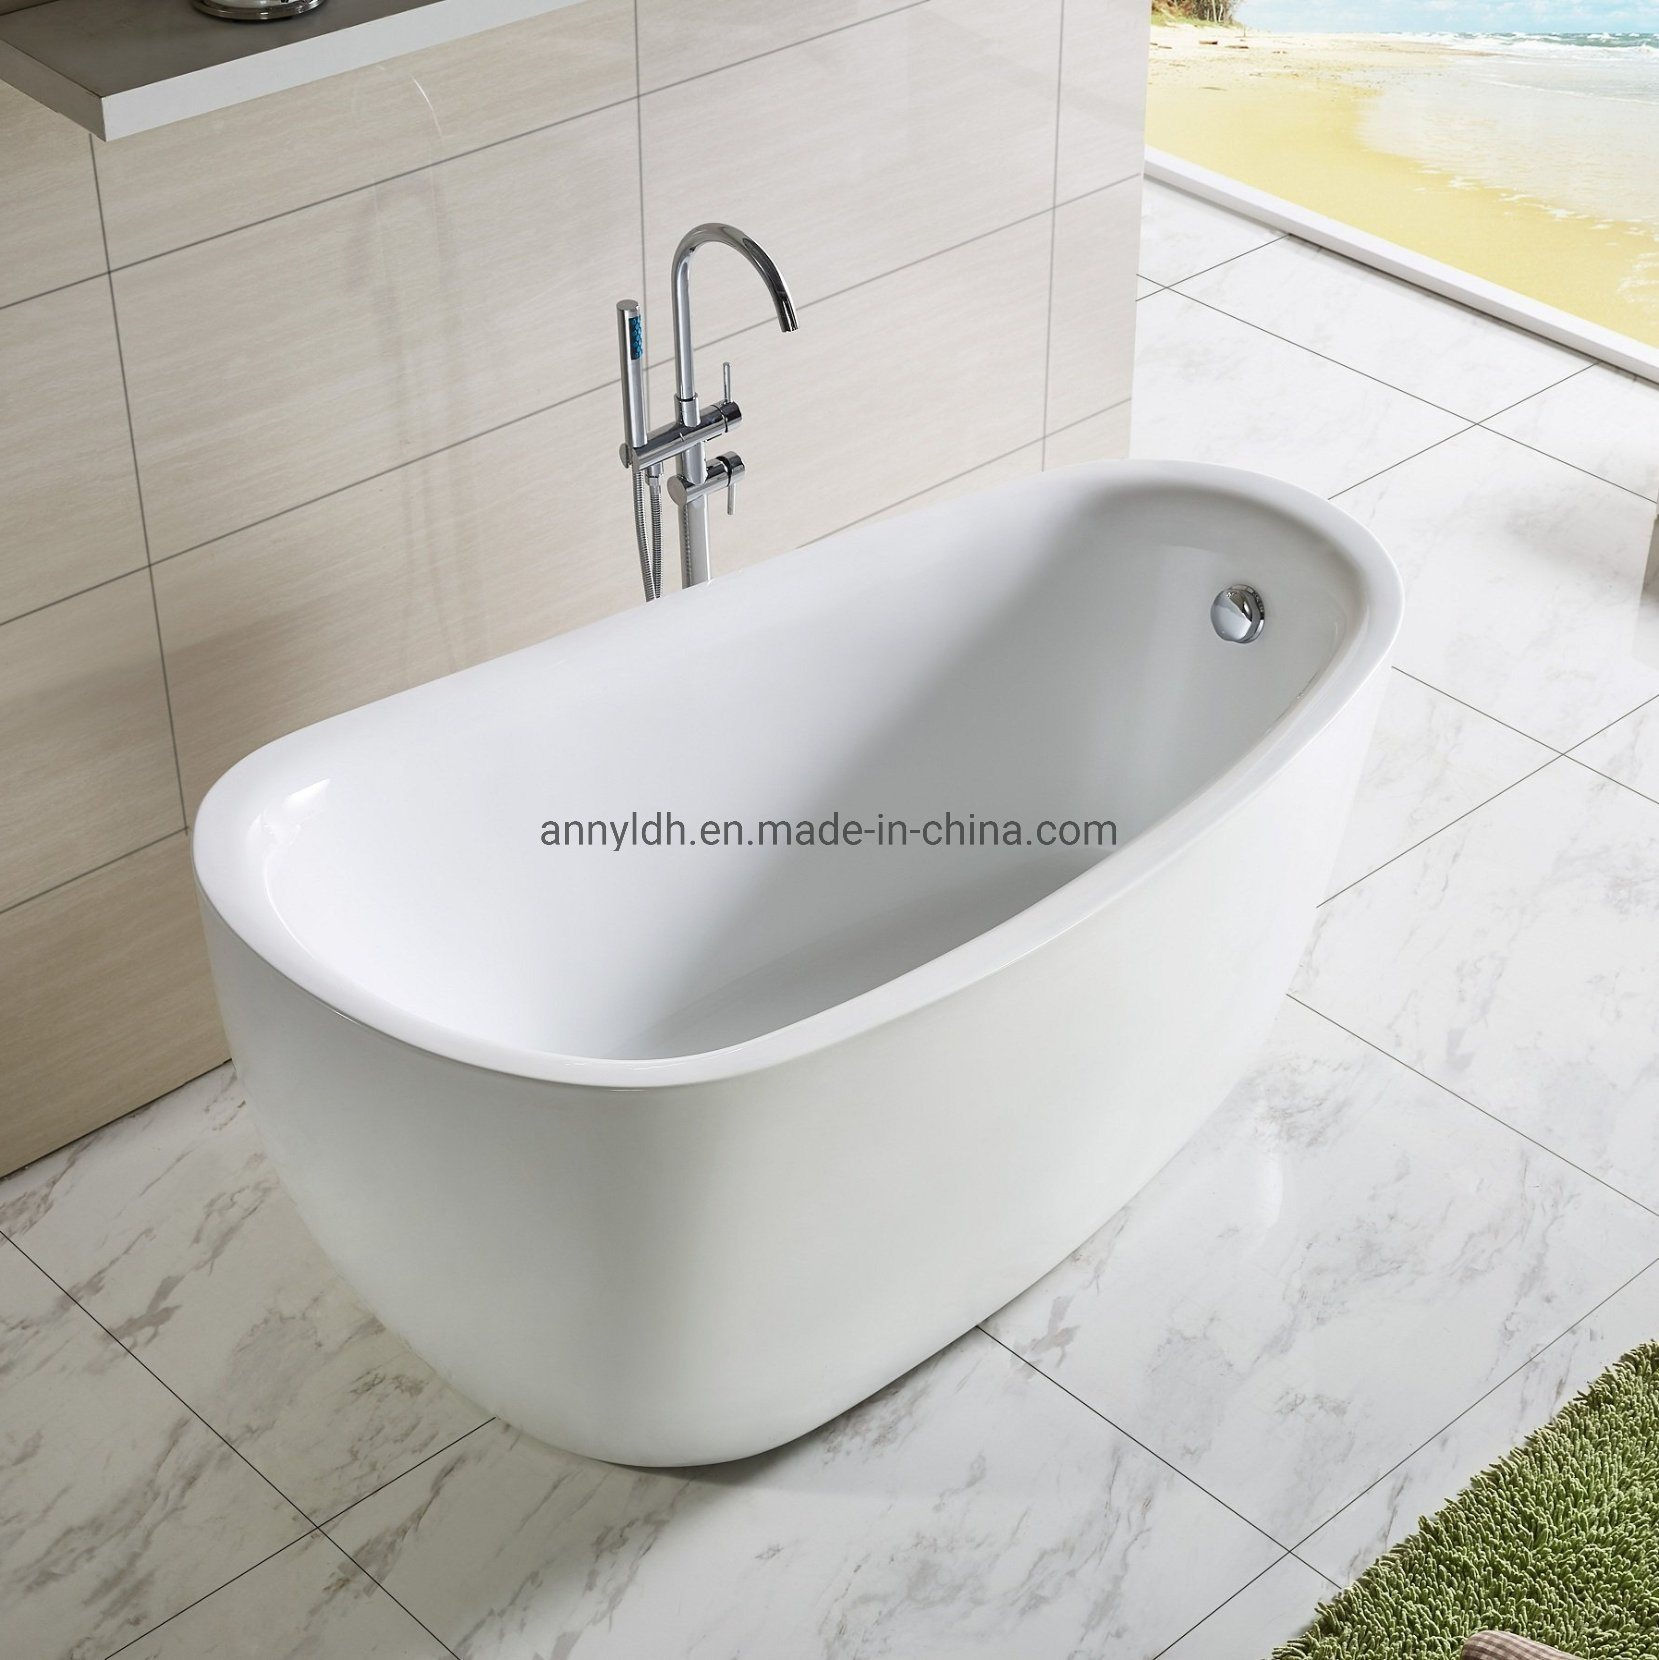 Hot Item Woma Deep Soaking Tub Freestanding Bathtub With Cupc Certificate Q168